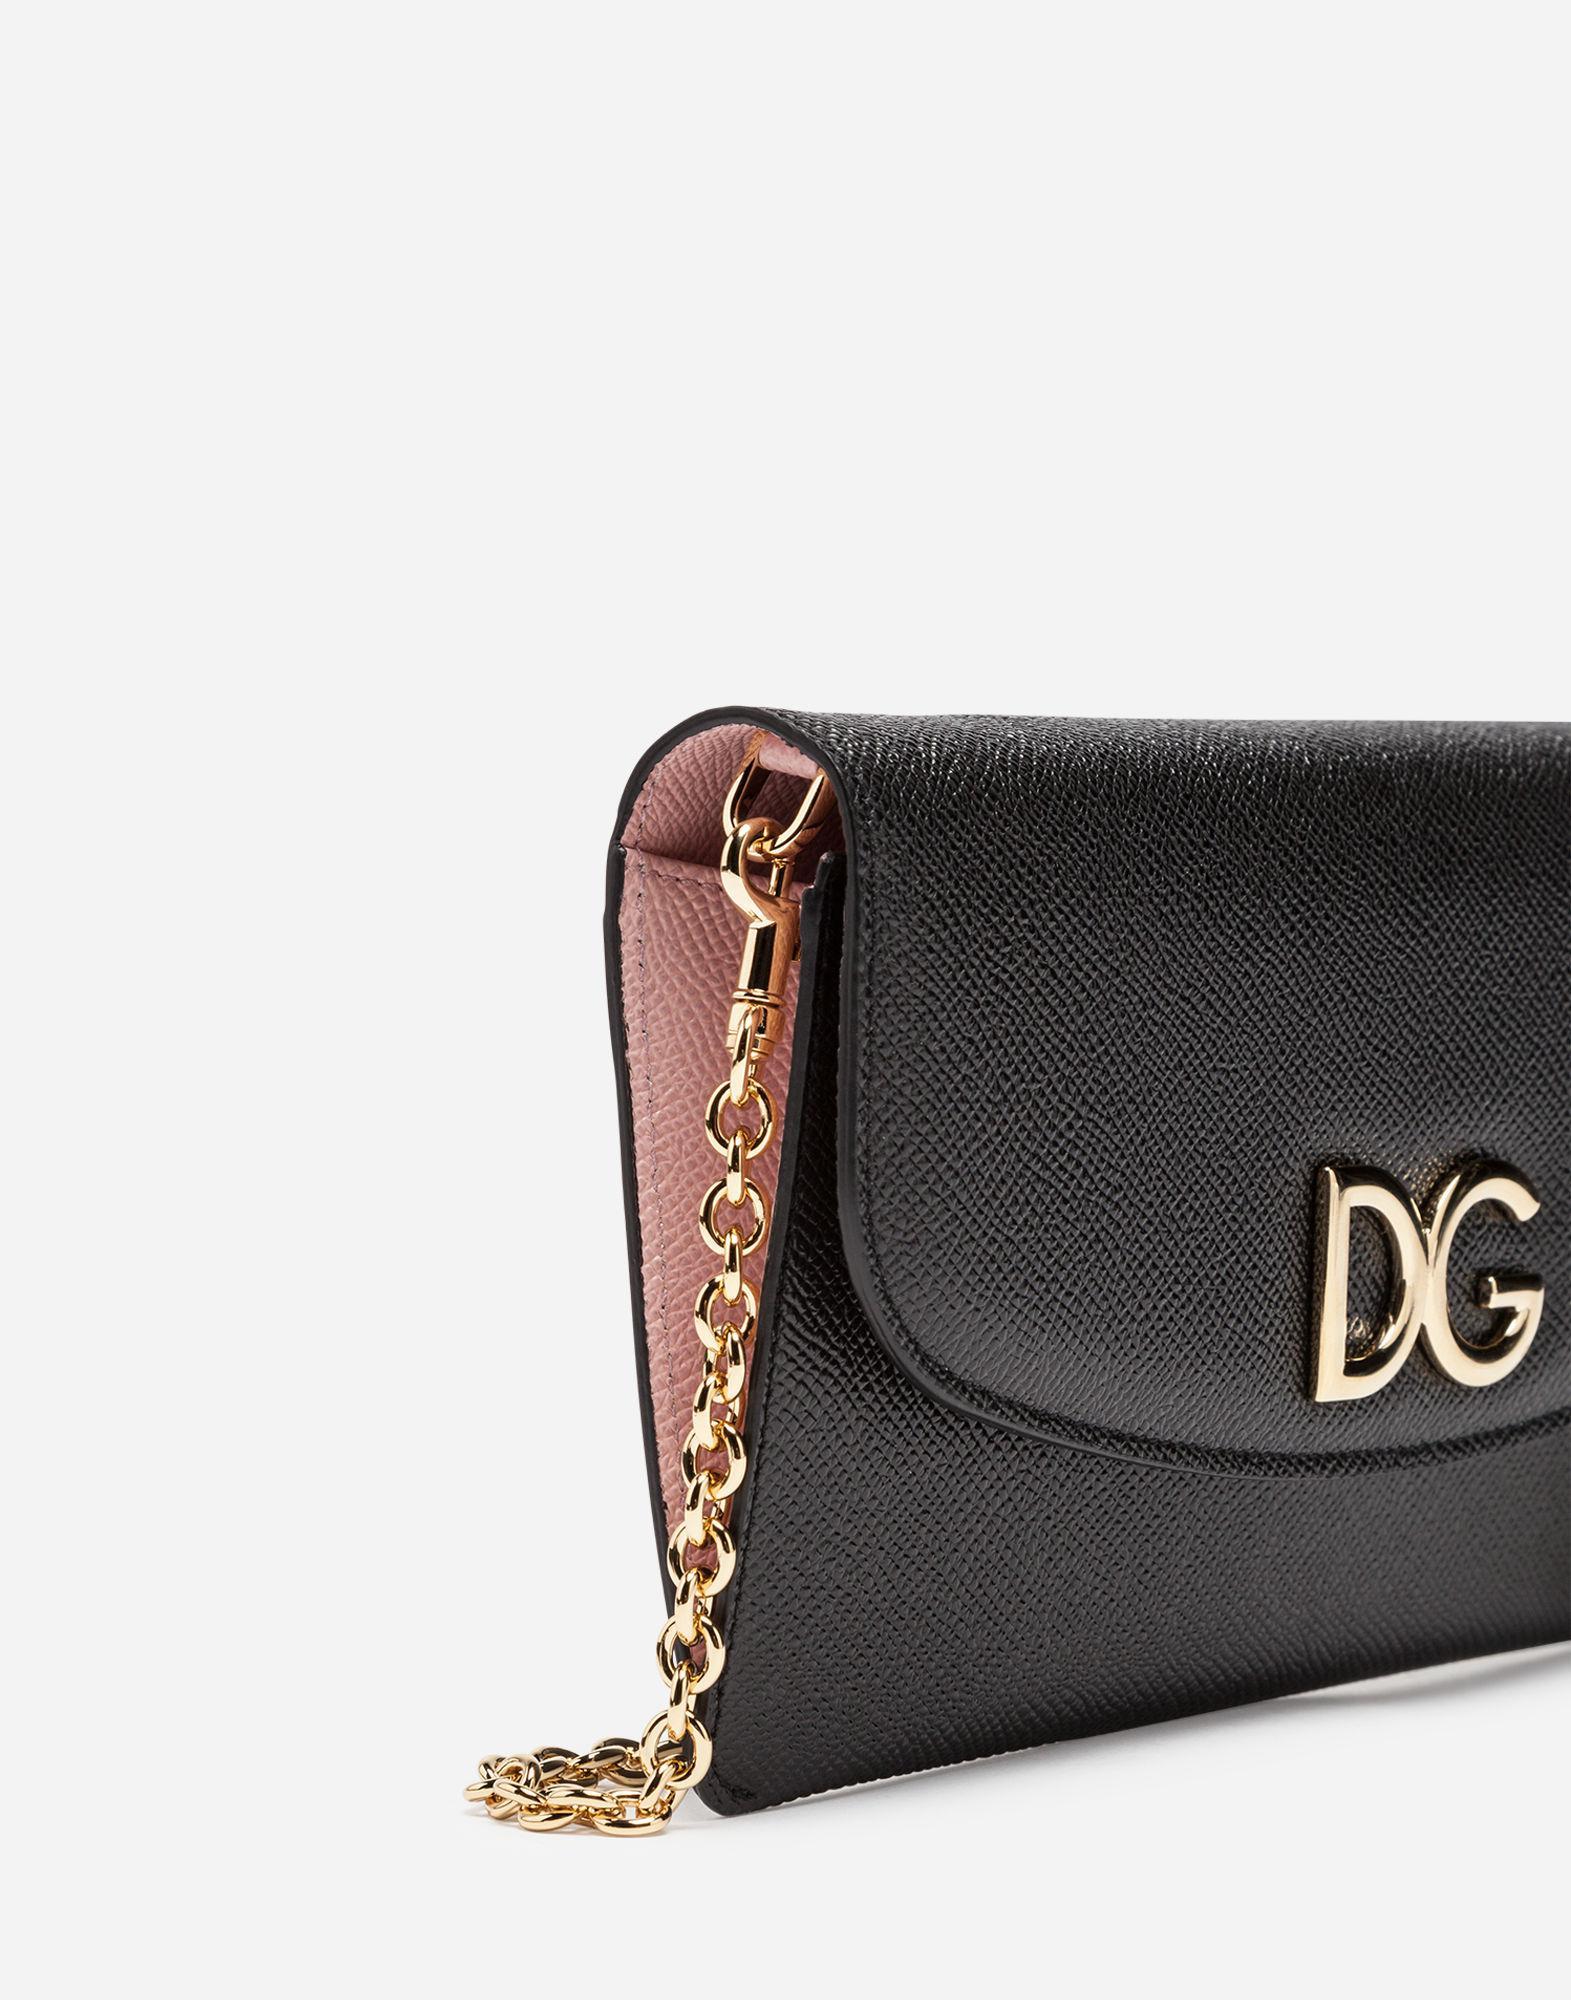 c94c995cd614 Lyst - Dolce   Gabbana Leather Wallet Bag in Black